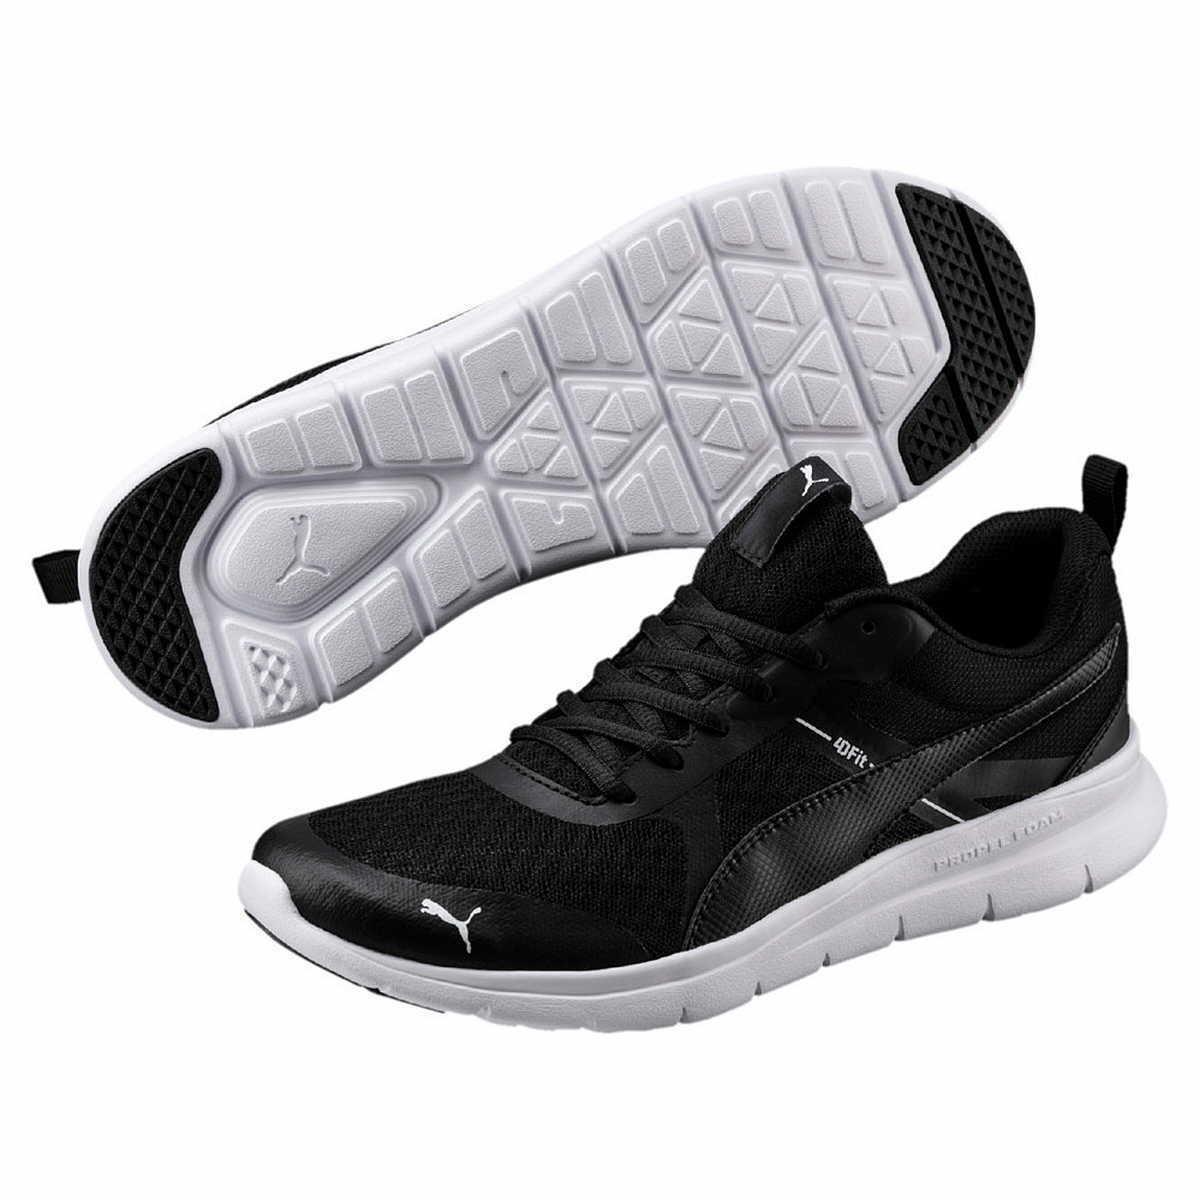 Puma schwarz Sneaker Flex Essential softfoam schwarz Puma Freizeit Turnschuhe 365268 d08a05